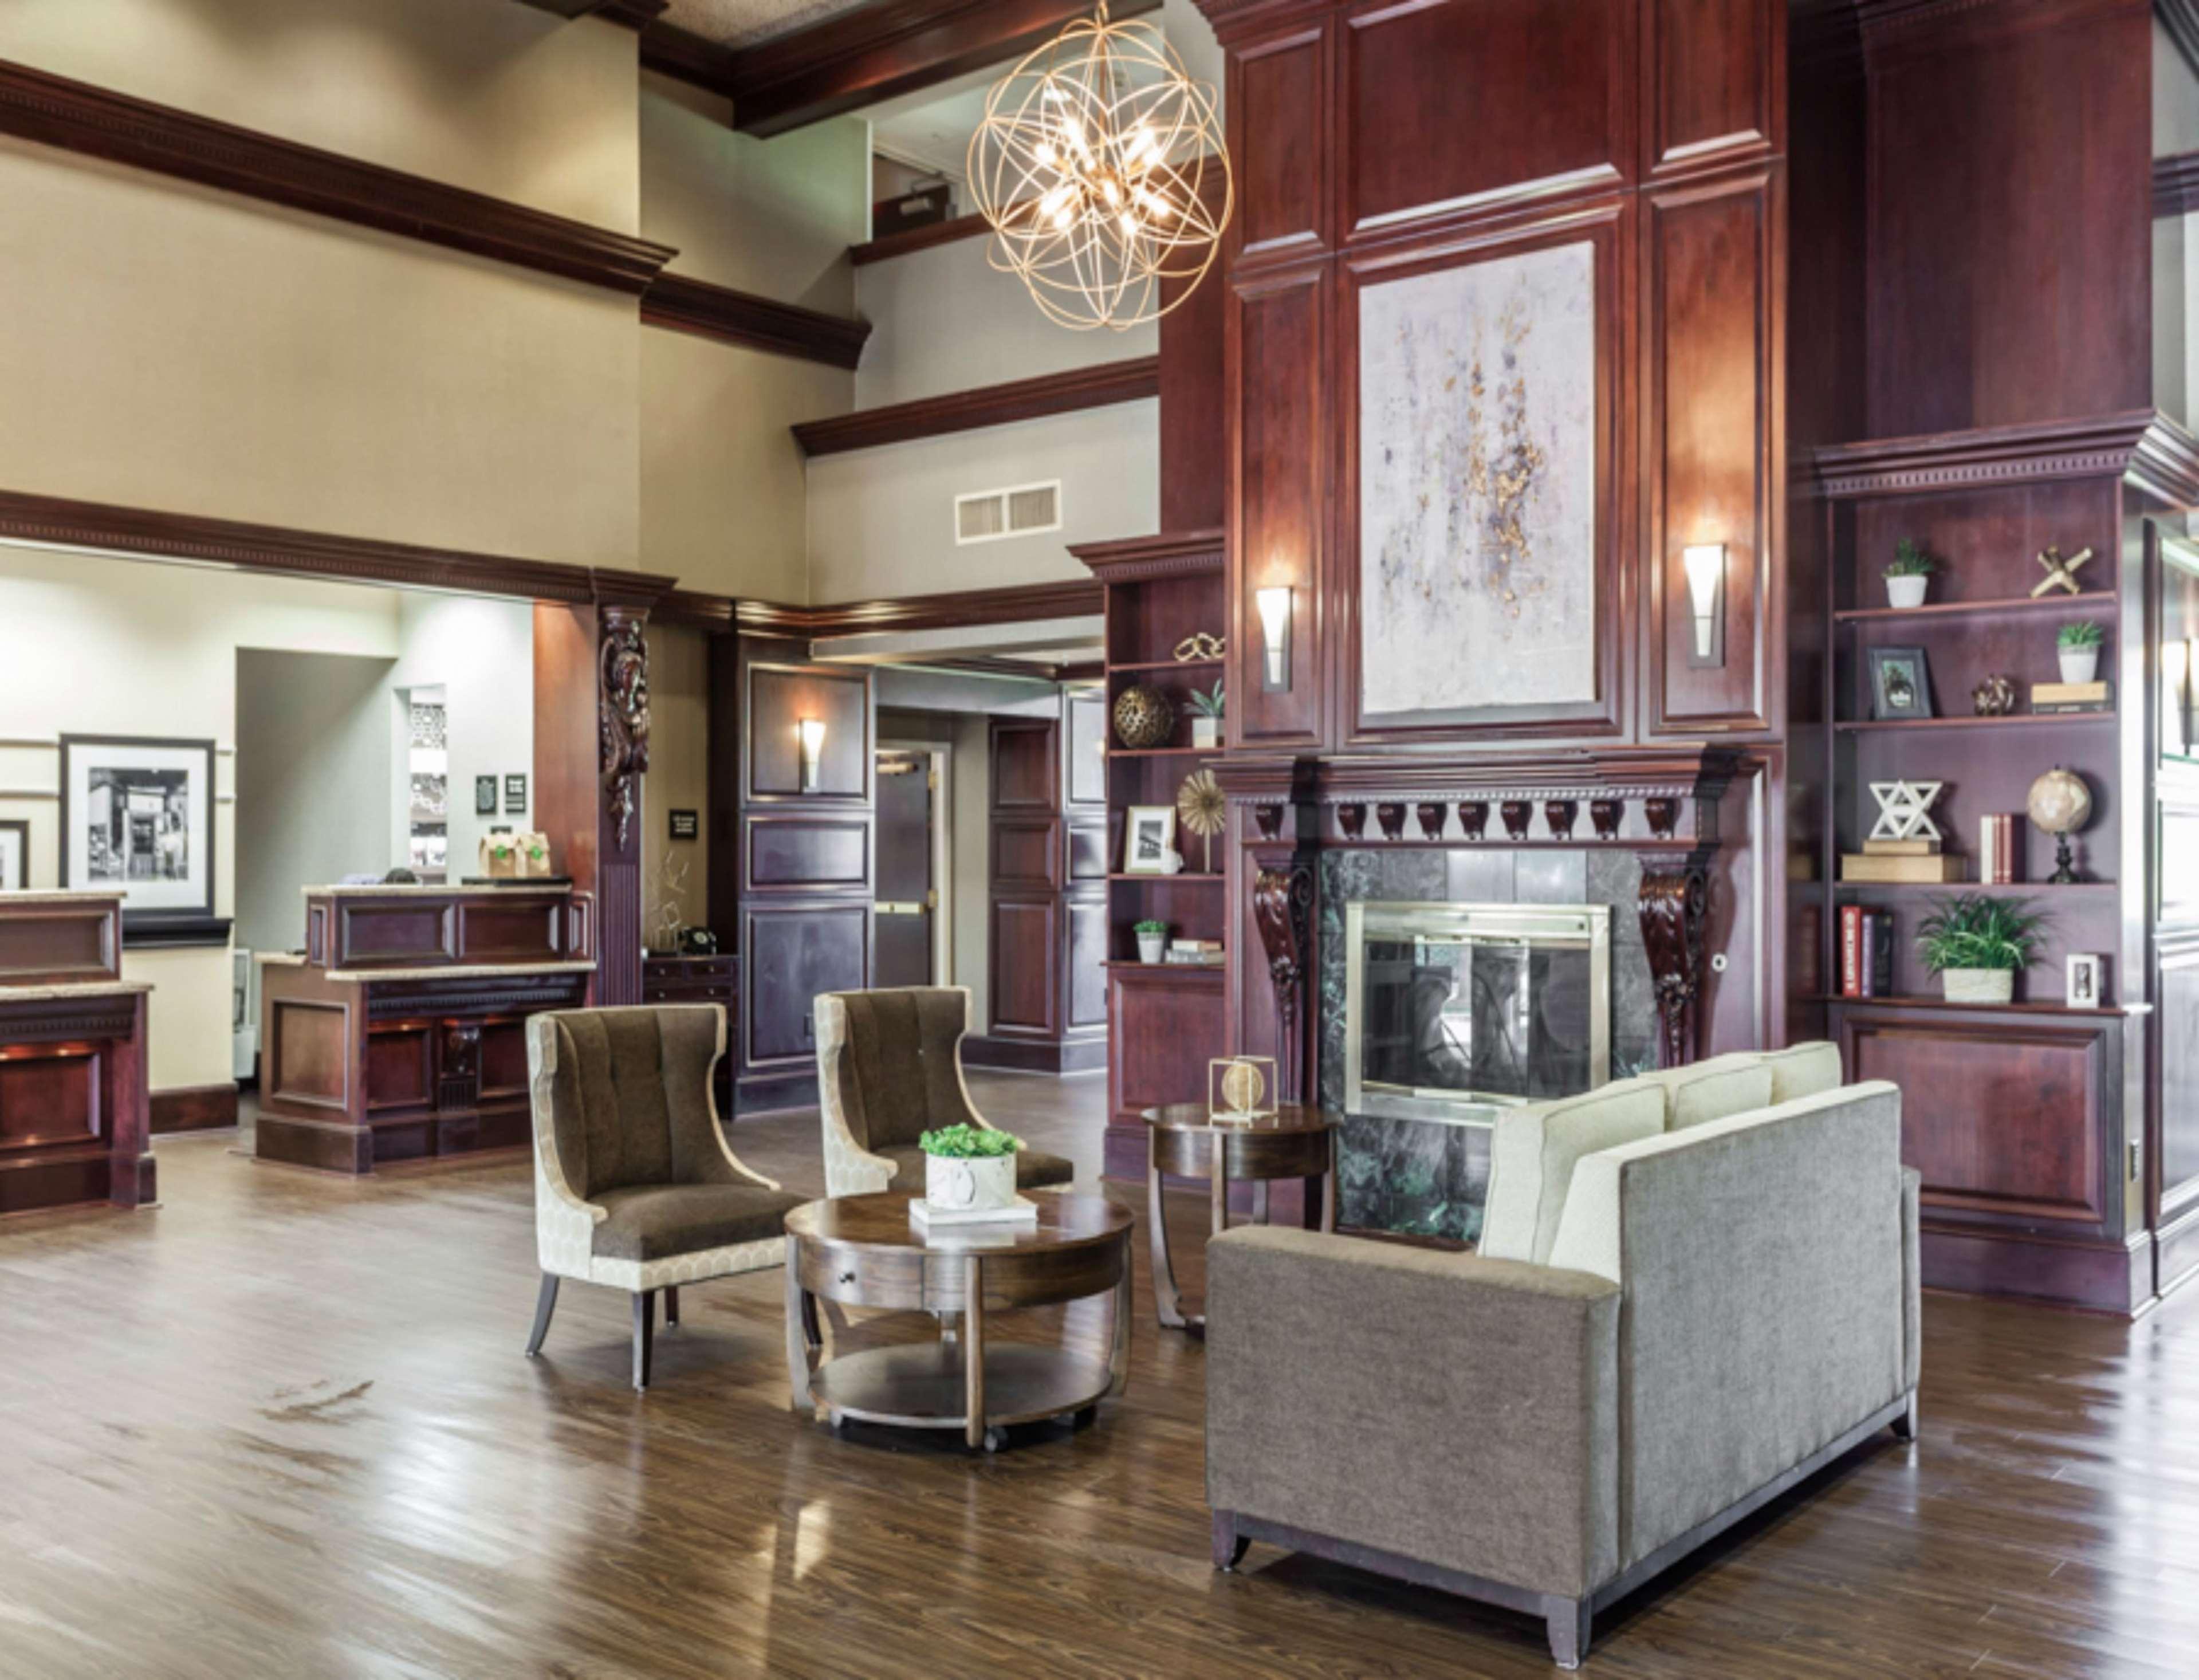 Hampton Inn & Suites Dallas-DFW Airport North-Grapevine image 2